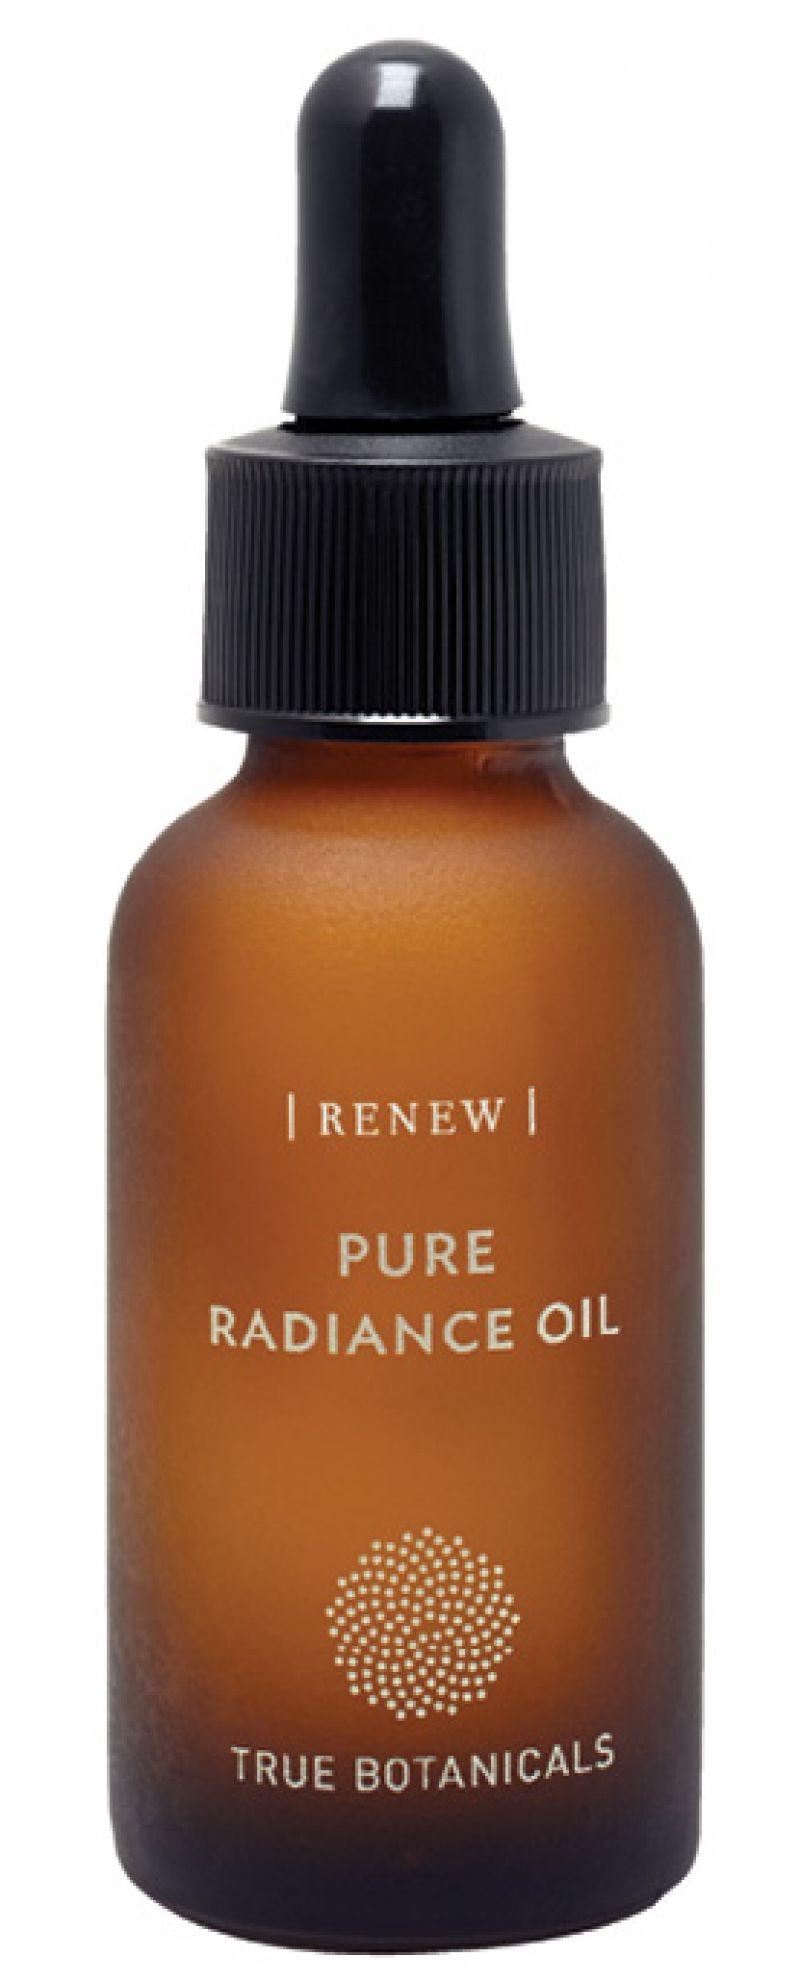 Renew Pure Radiance Oil by True Botanicals